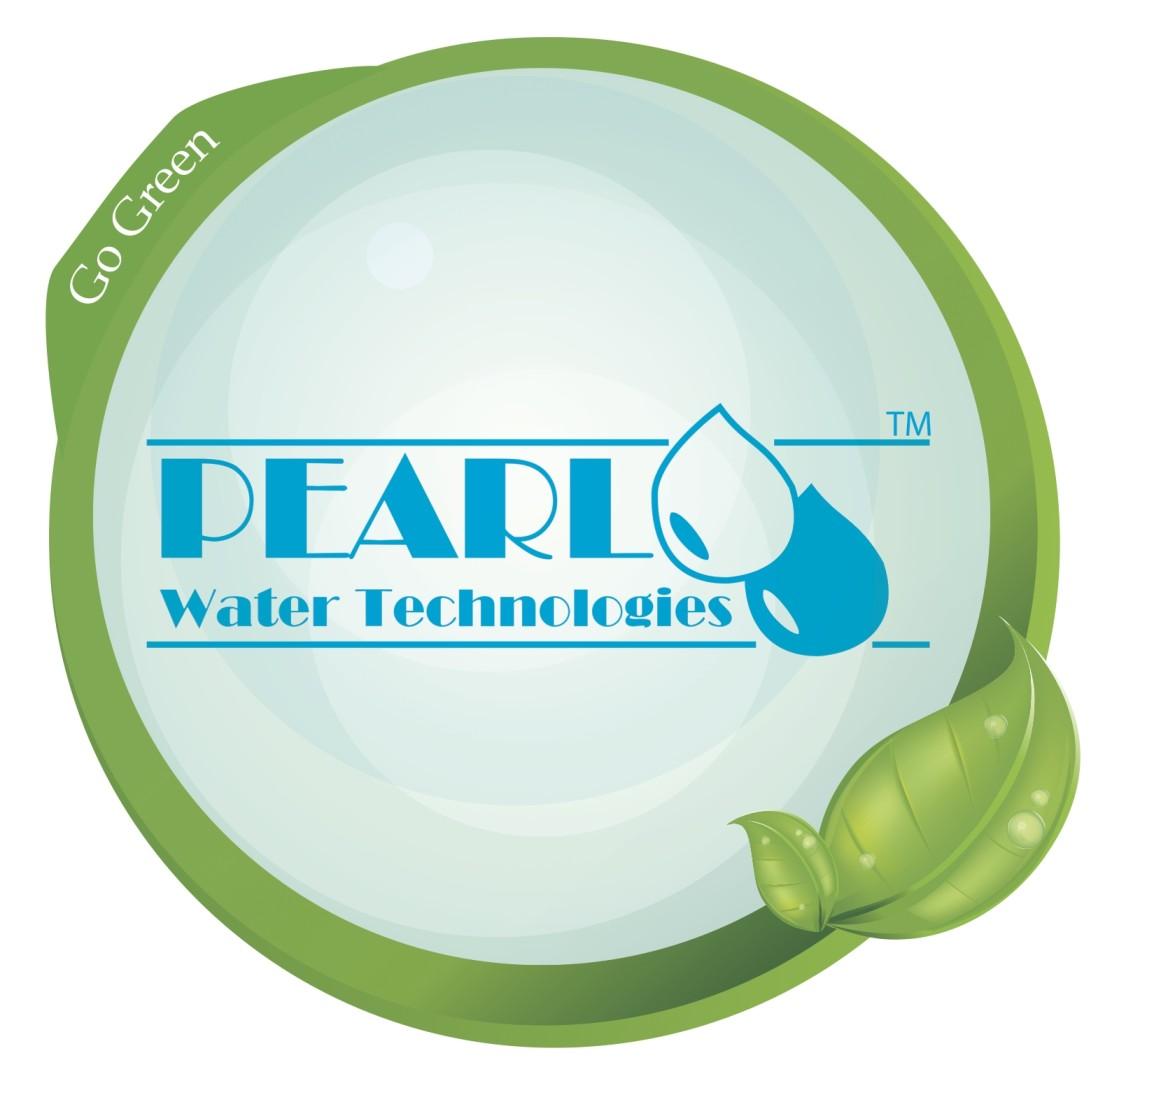 Pearl Water Logo